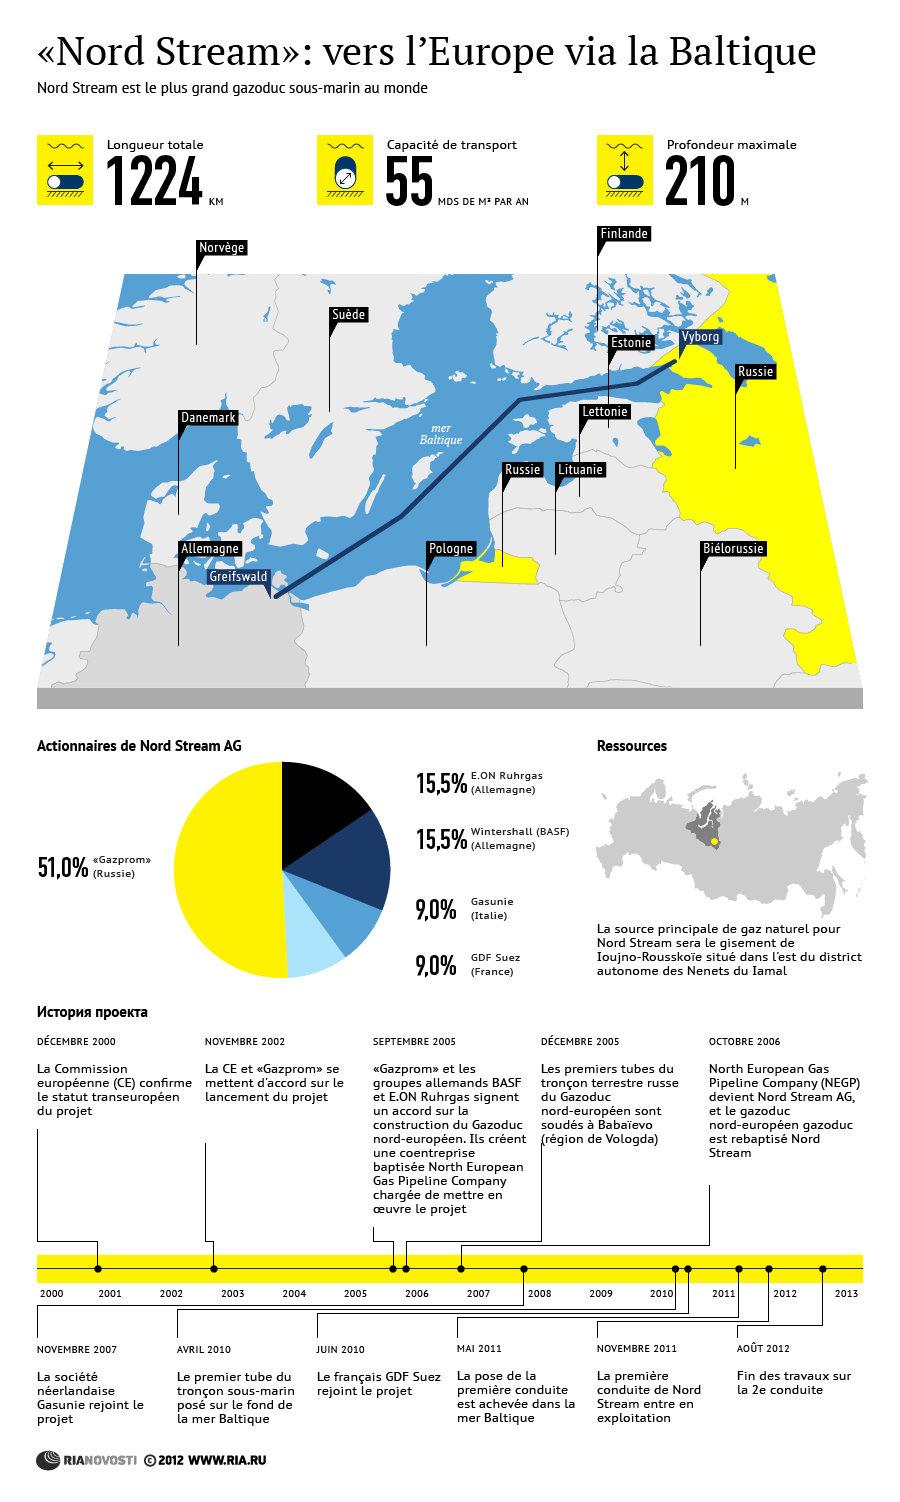 Nord Stream: vers l'Europe via la Baltique - Sputnik France